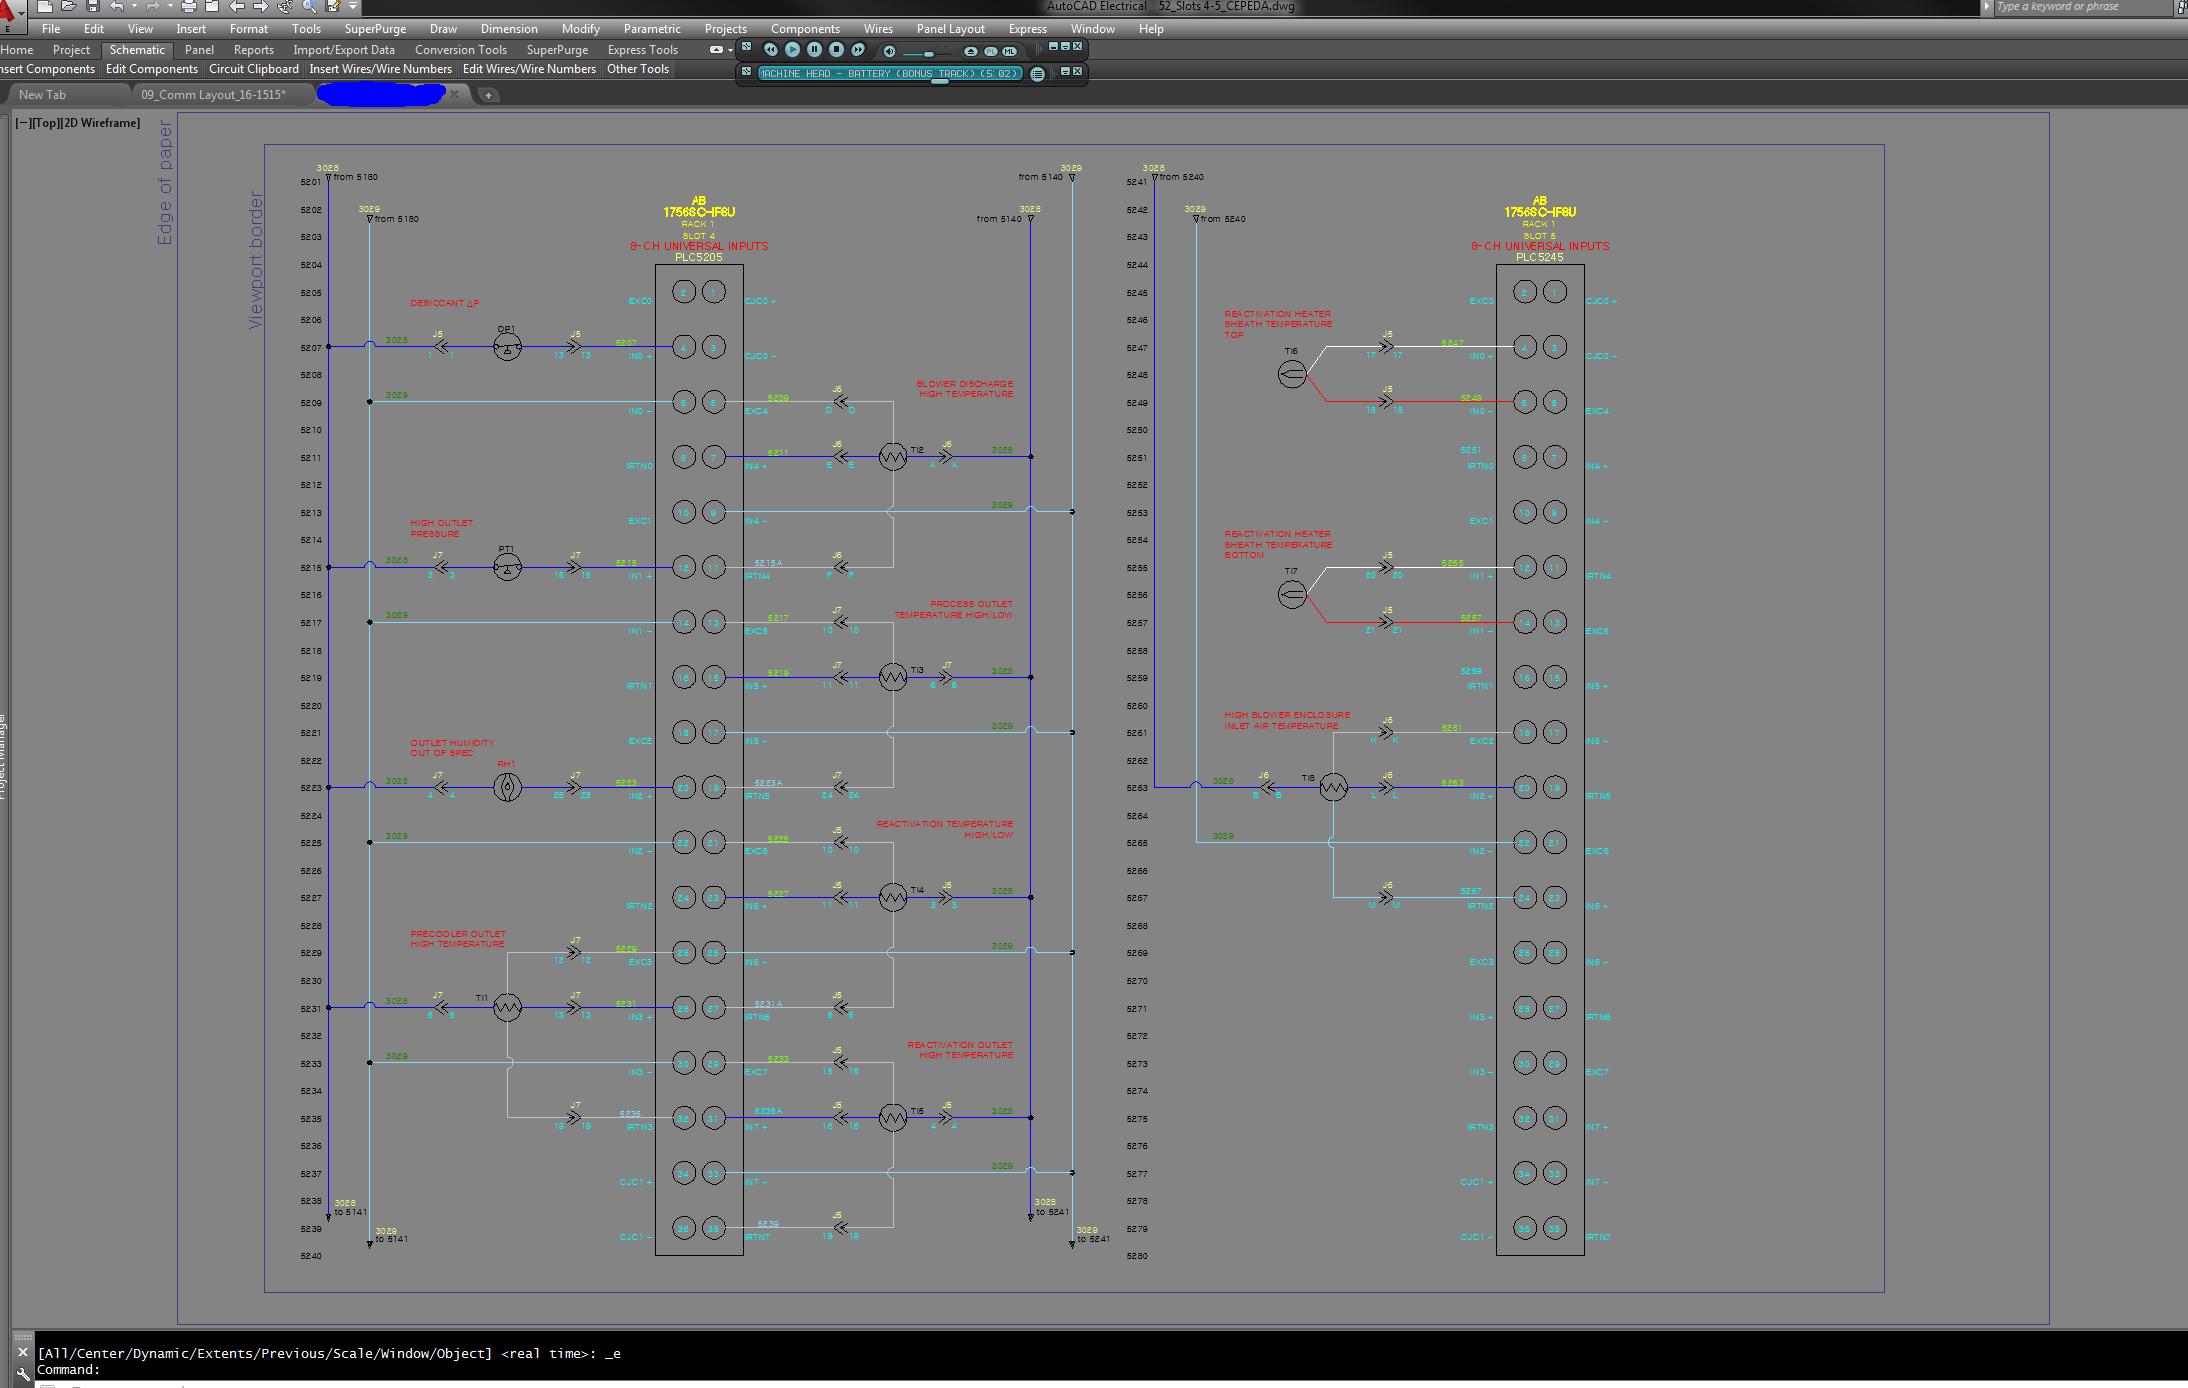 JIC & NFPA Photoelectric Switch / Photoeye Sensor Symbols - Autodesk ...